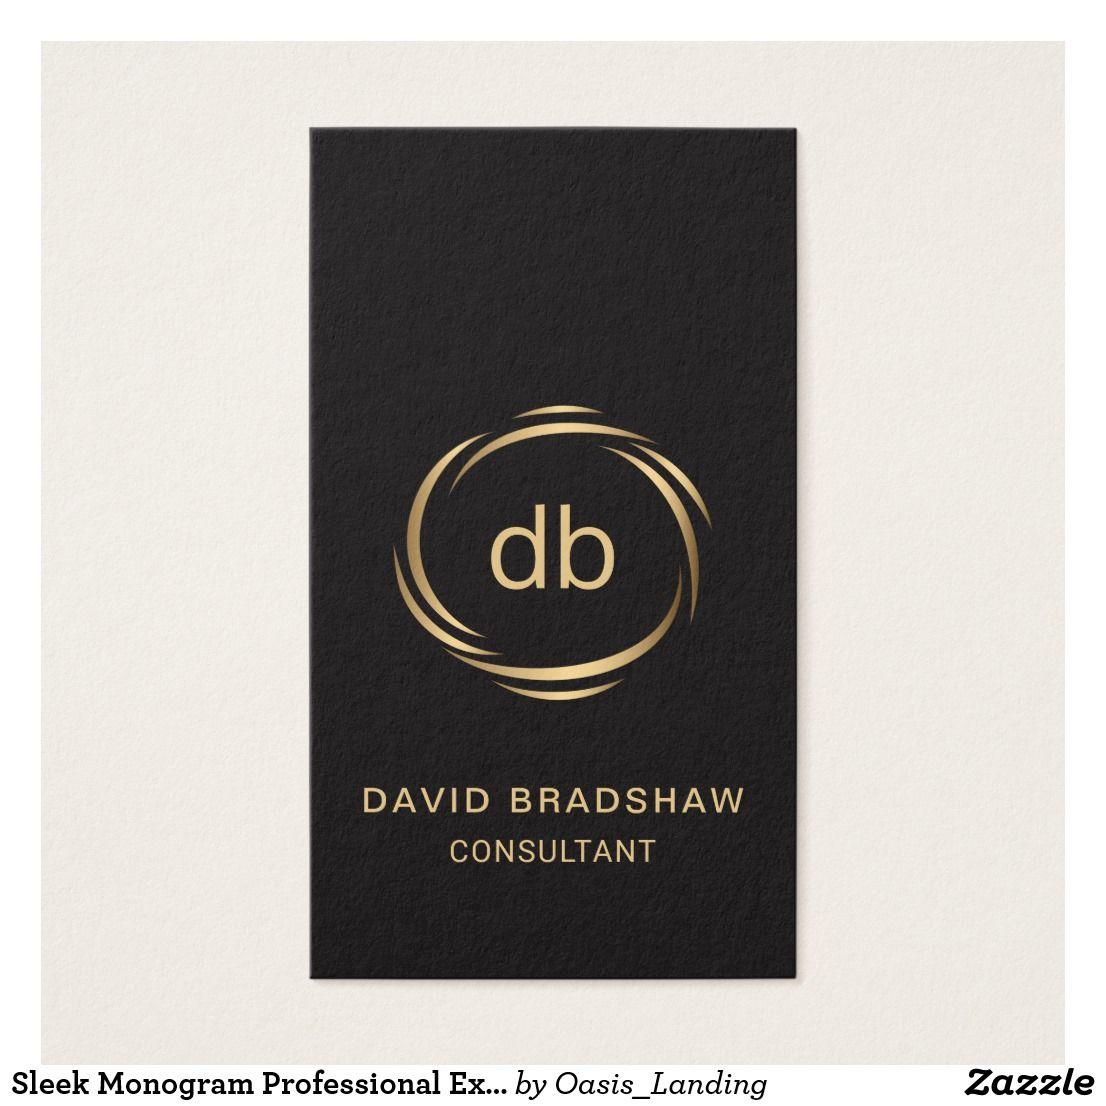 Sleek Monogram Professional Executive Business Card   Business cards